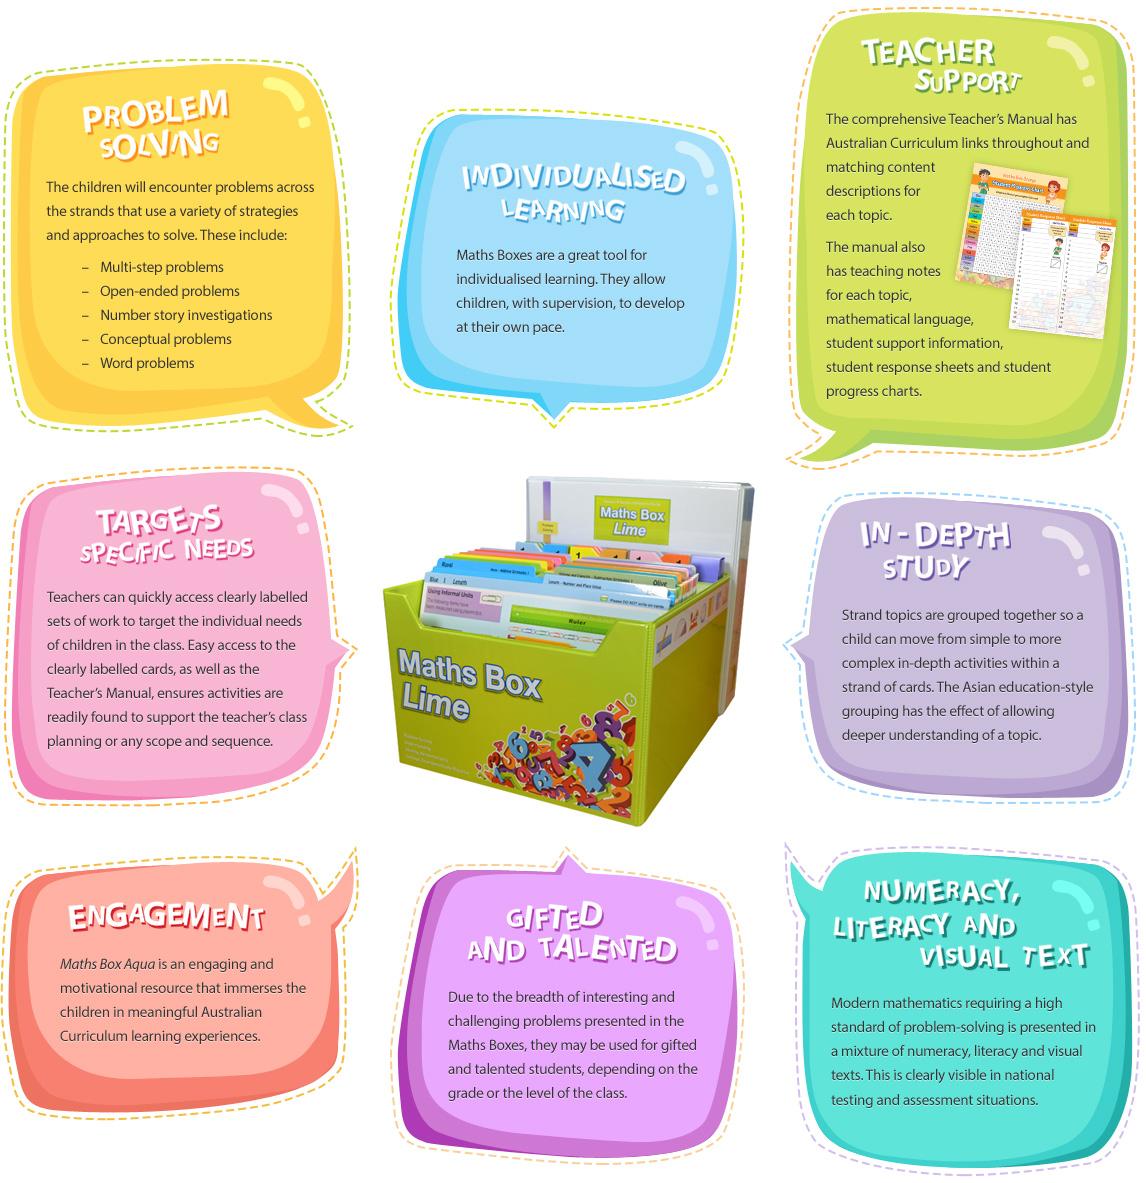 Maths Box Lime - Teachers 4 Teachers Publications Pty Ltd